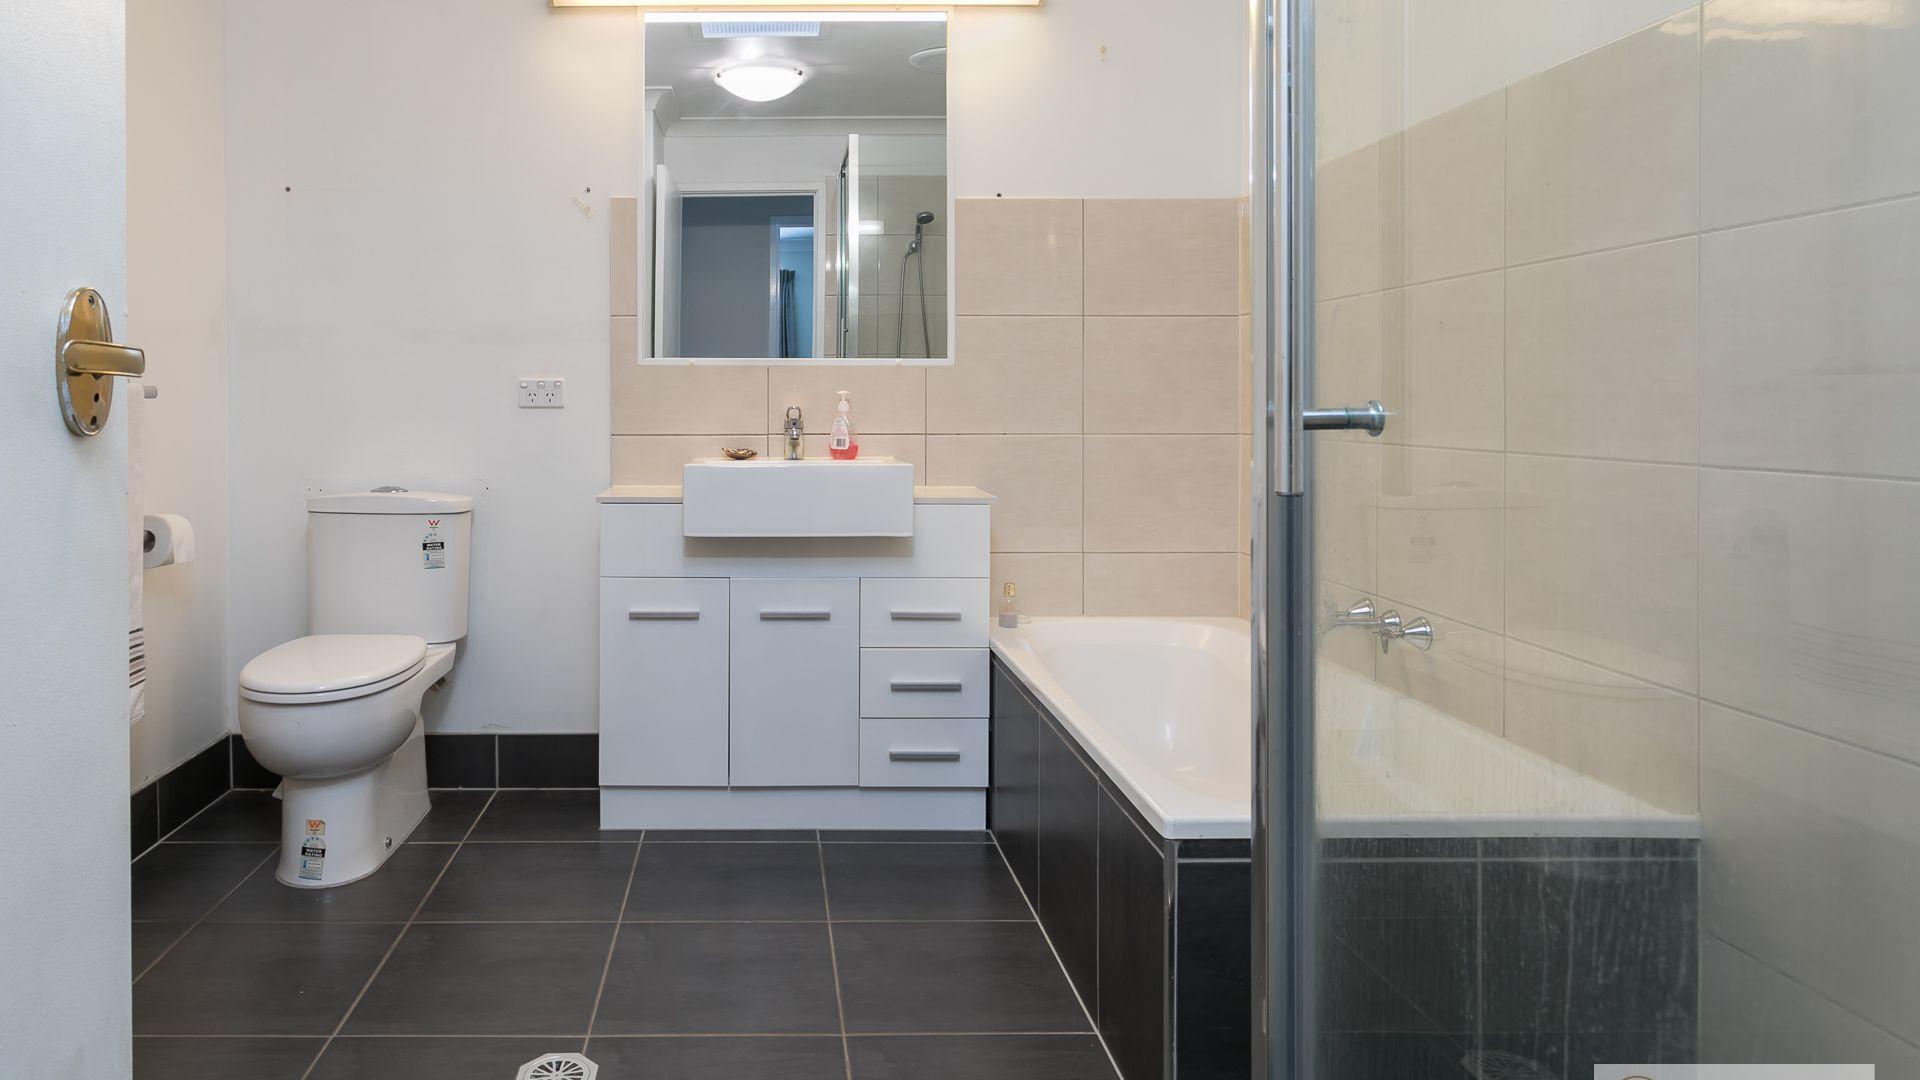 98/205 Thorneside Road, Thorneside QLD 4158, Image 2